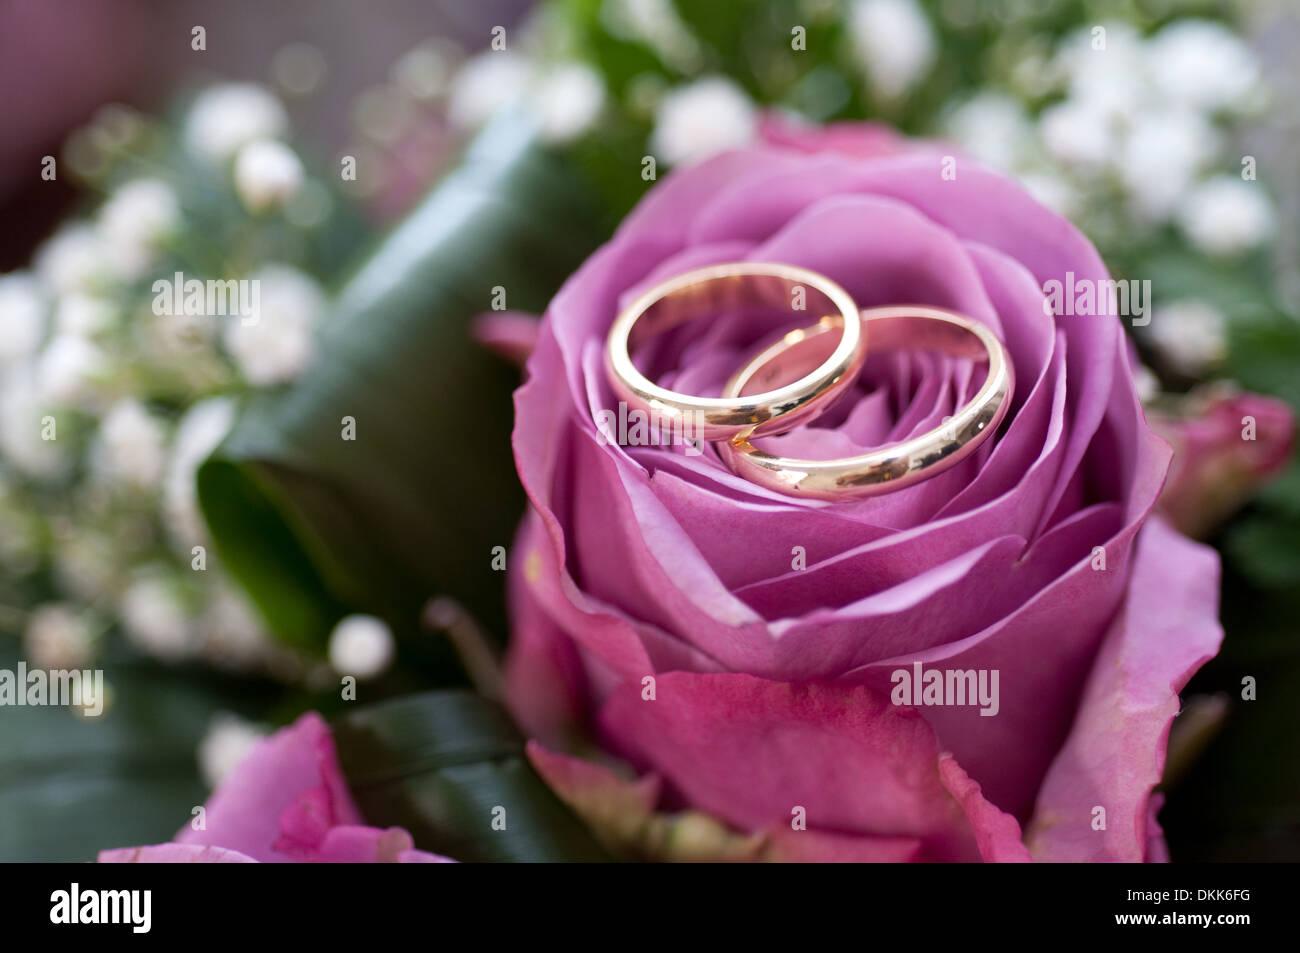 Wedding Rings On Rose Stock Photos & Wedding Rings On Rose Stock ...